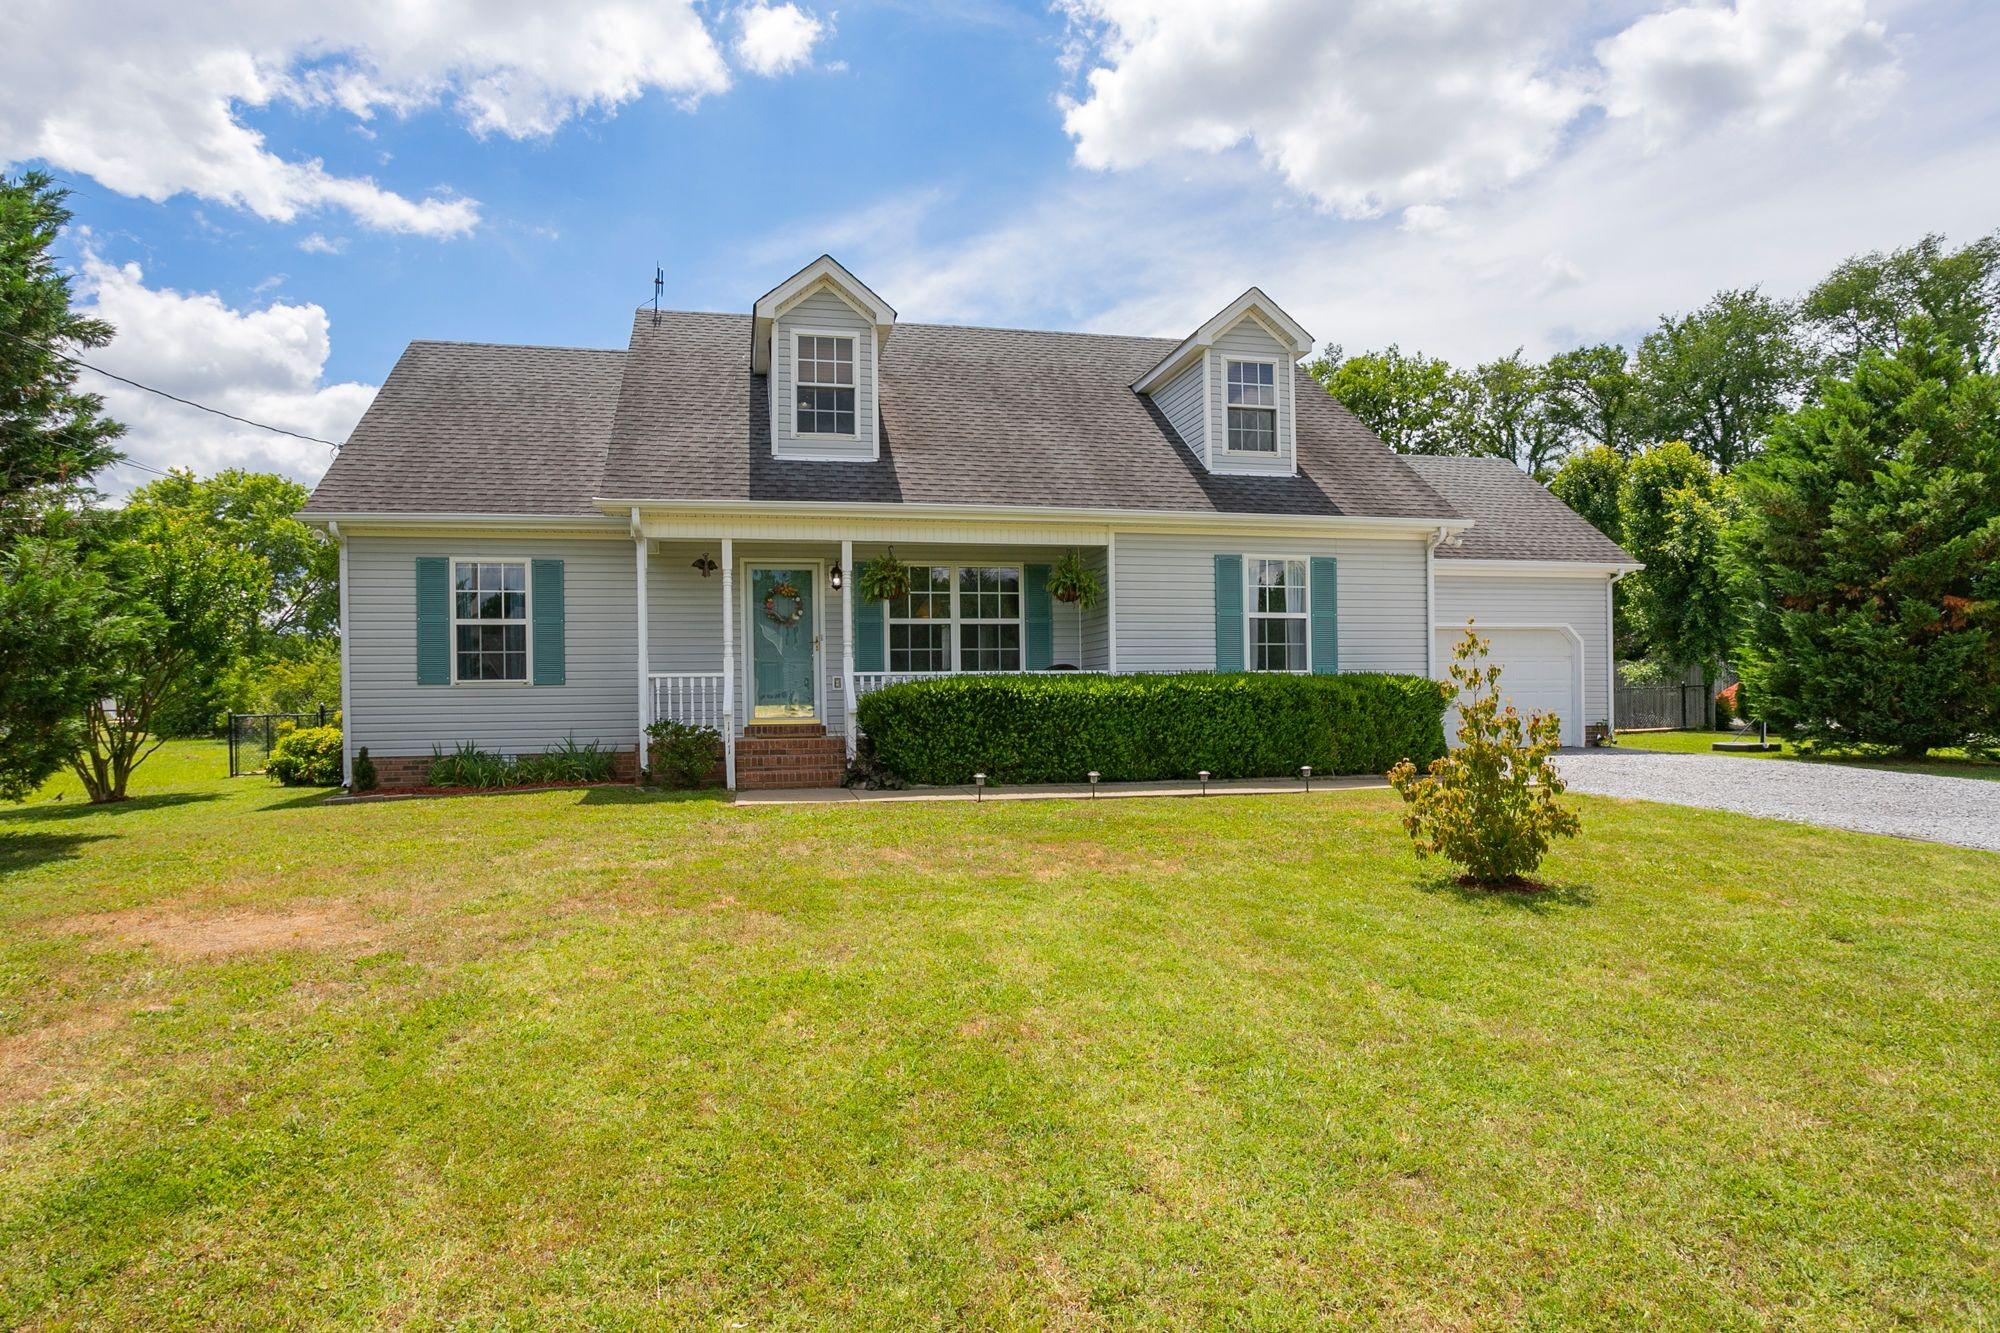 111 Fire Oak Ct Property Photo - Murfreesboro, TN real estate listing